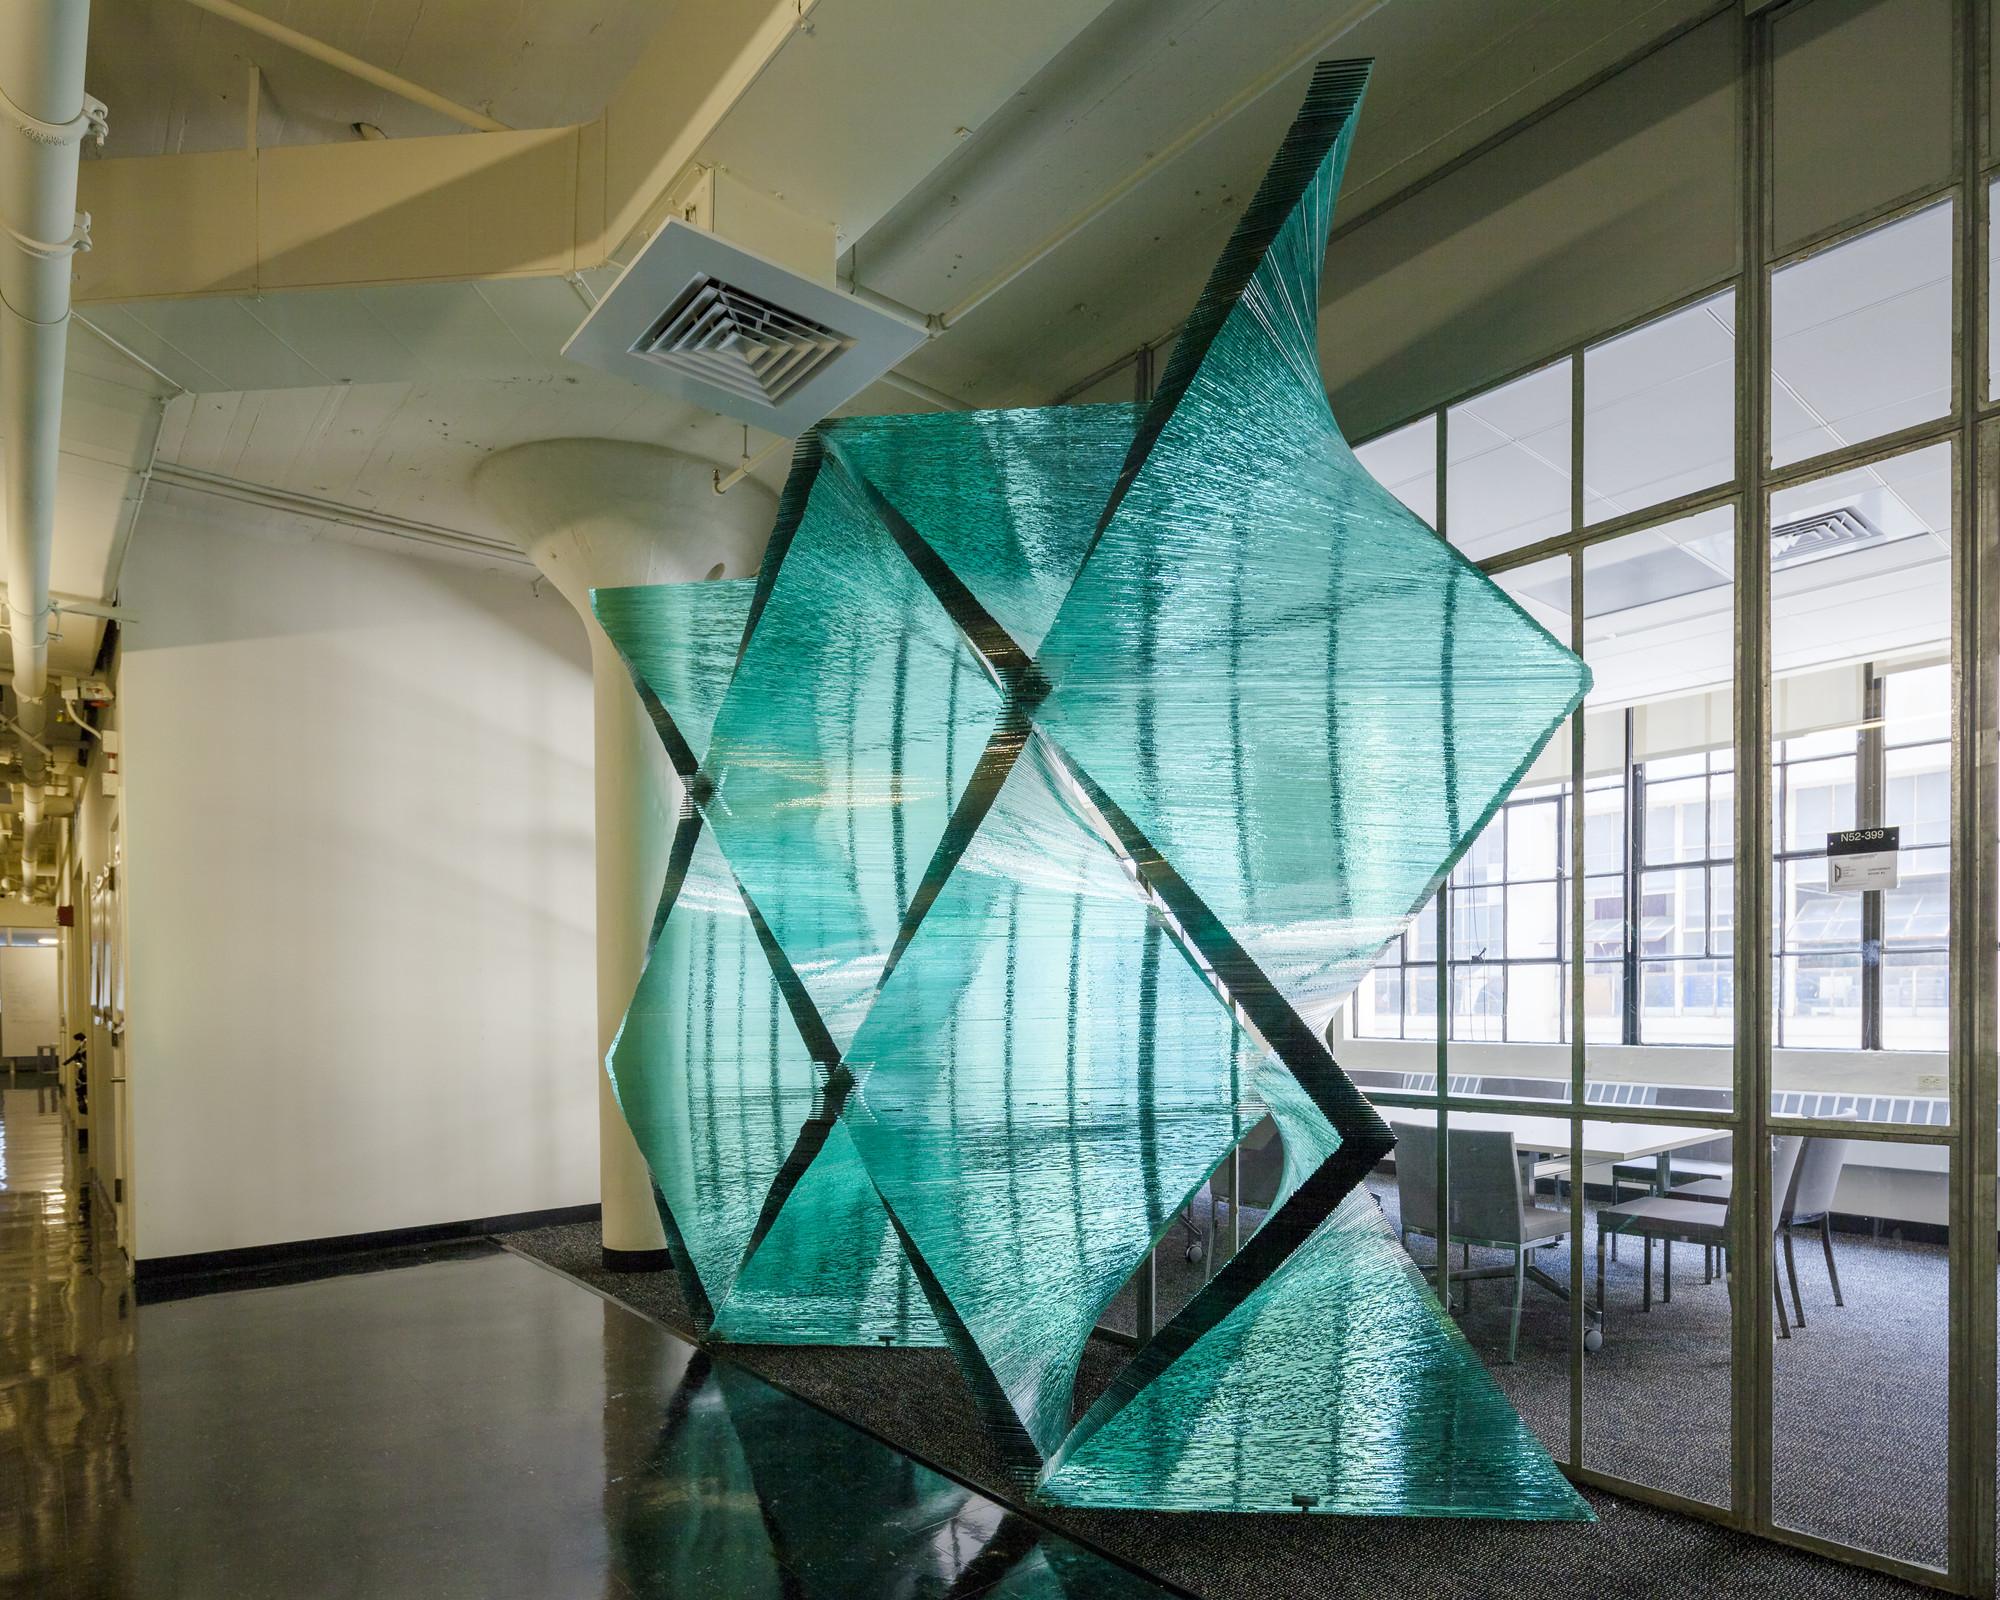 Gallery of Cristina Parreño Investigates the Tectonics of ...